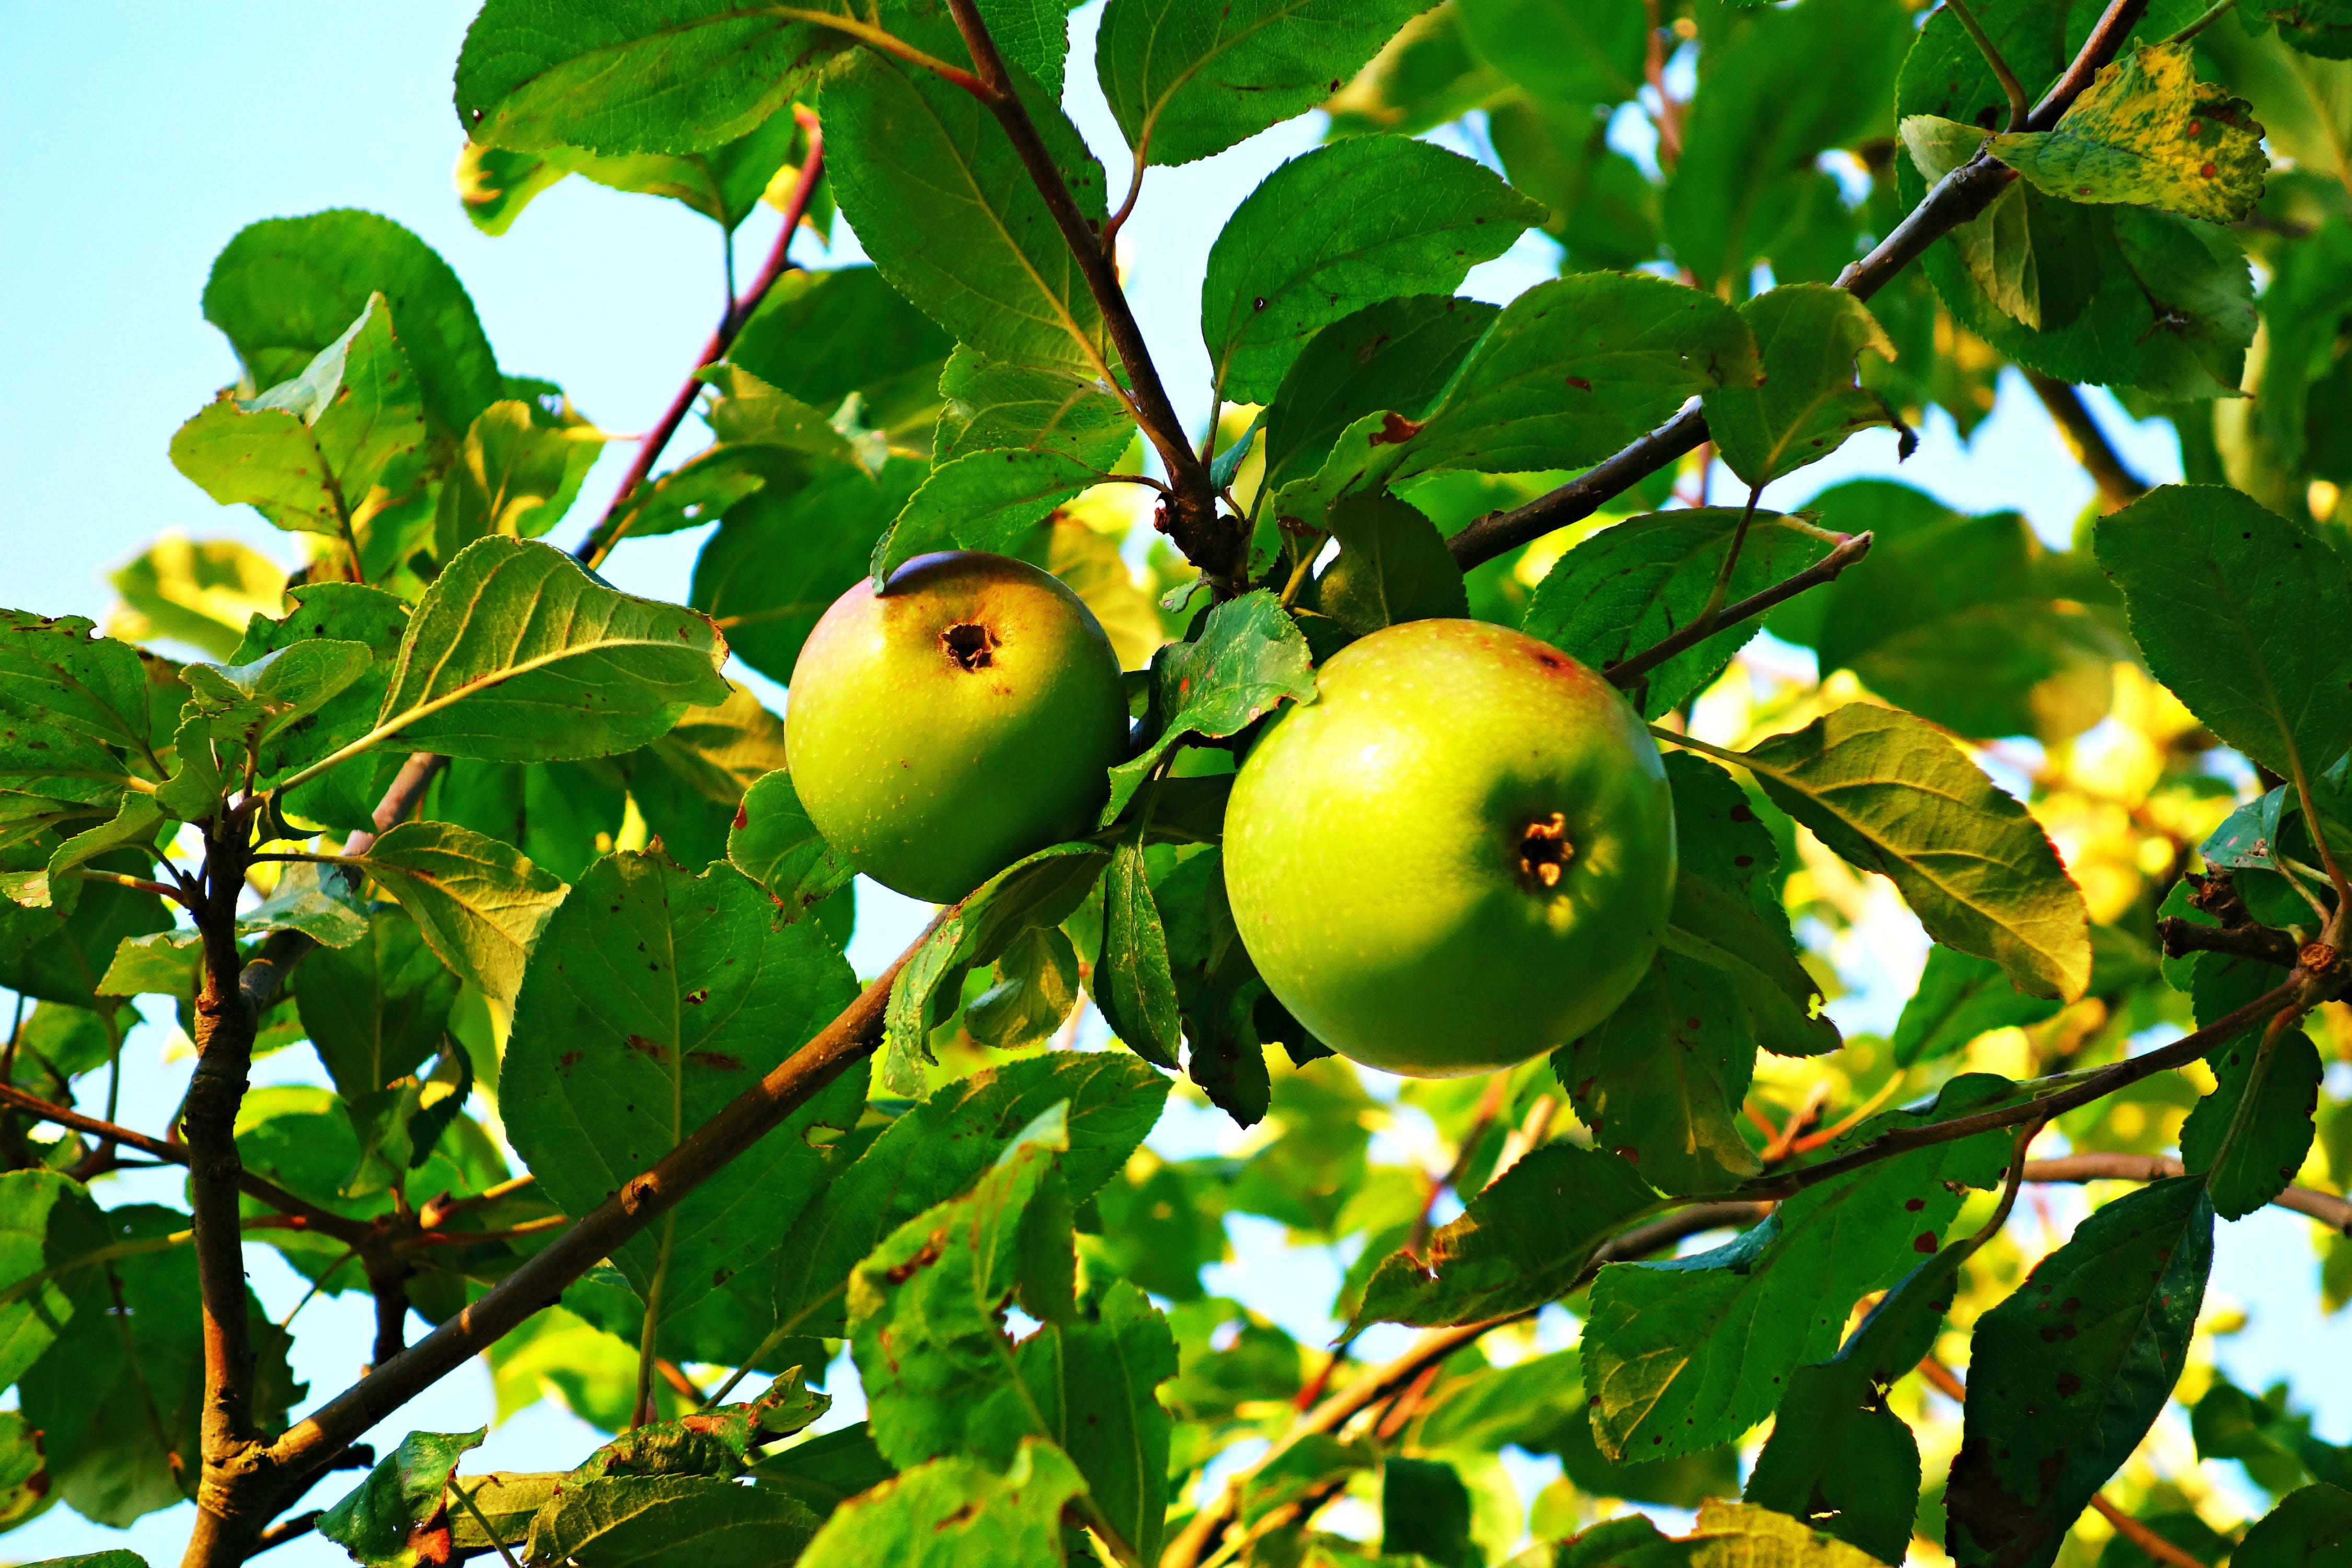 of apple, apple tree, bough, branch